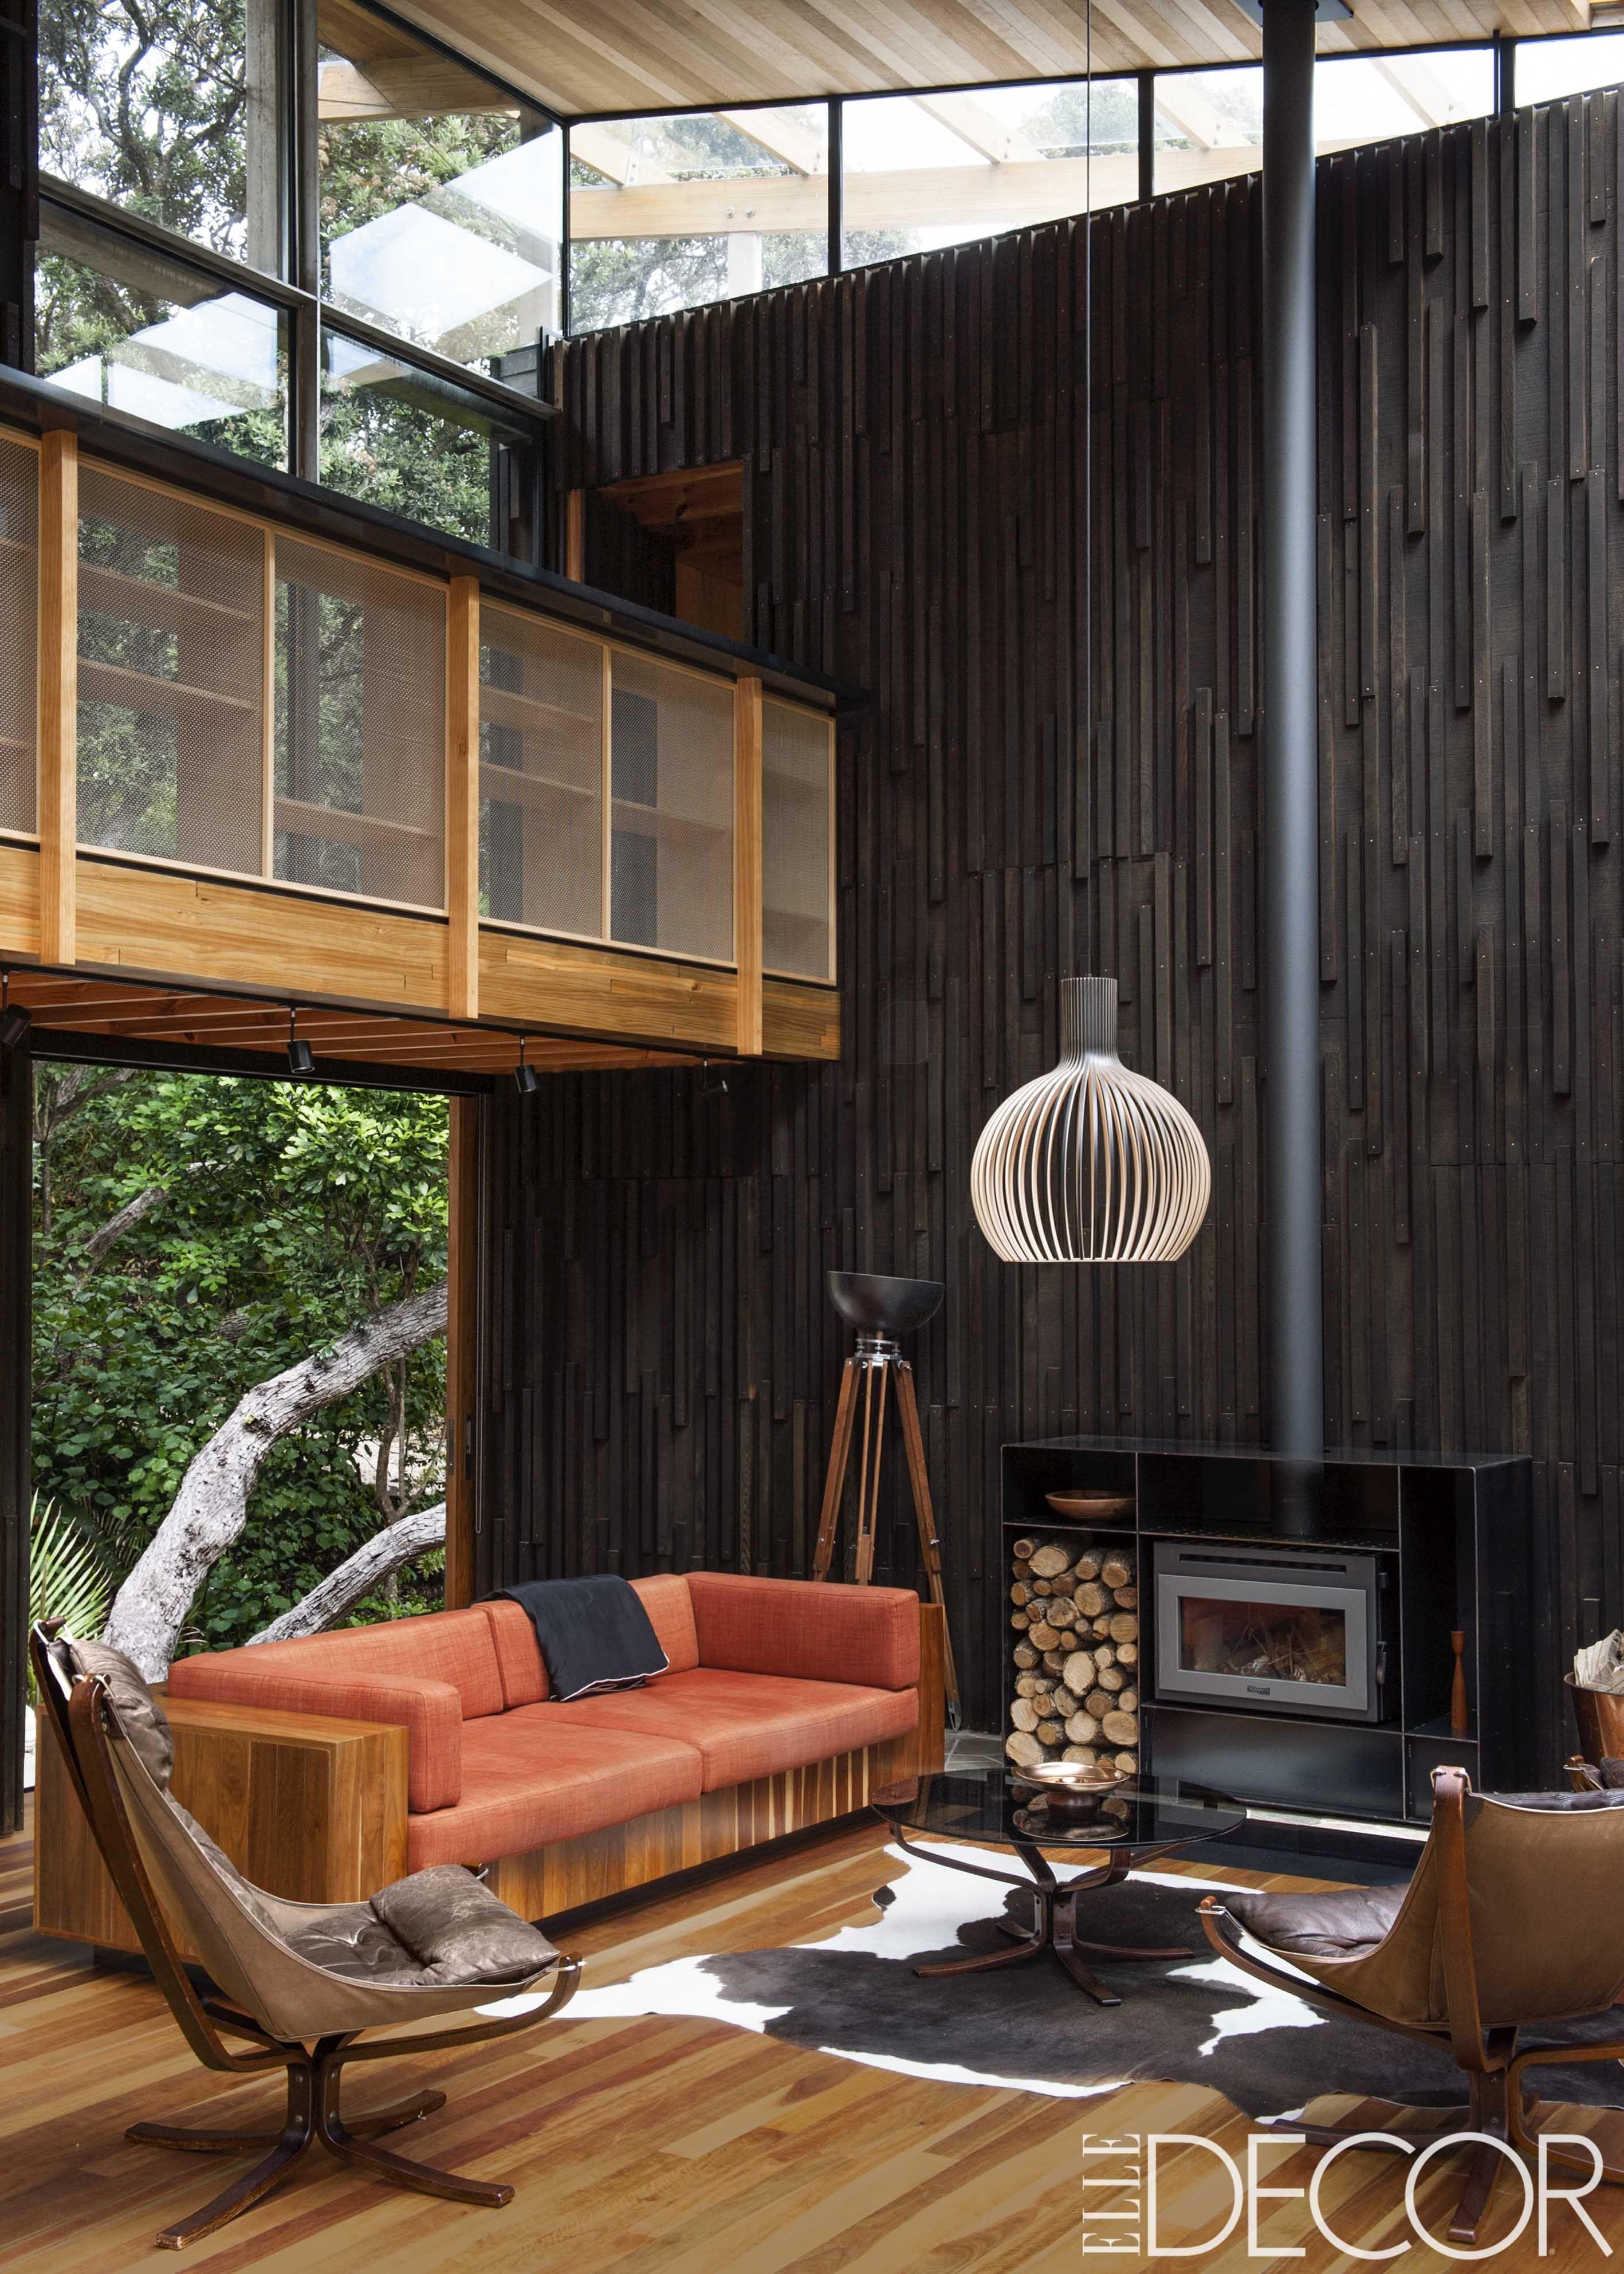 25 Fall Decorating Ideas Cozy Autumn Rooms